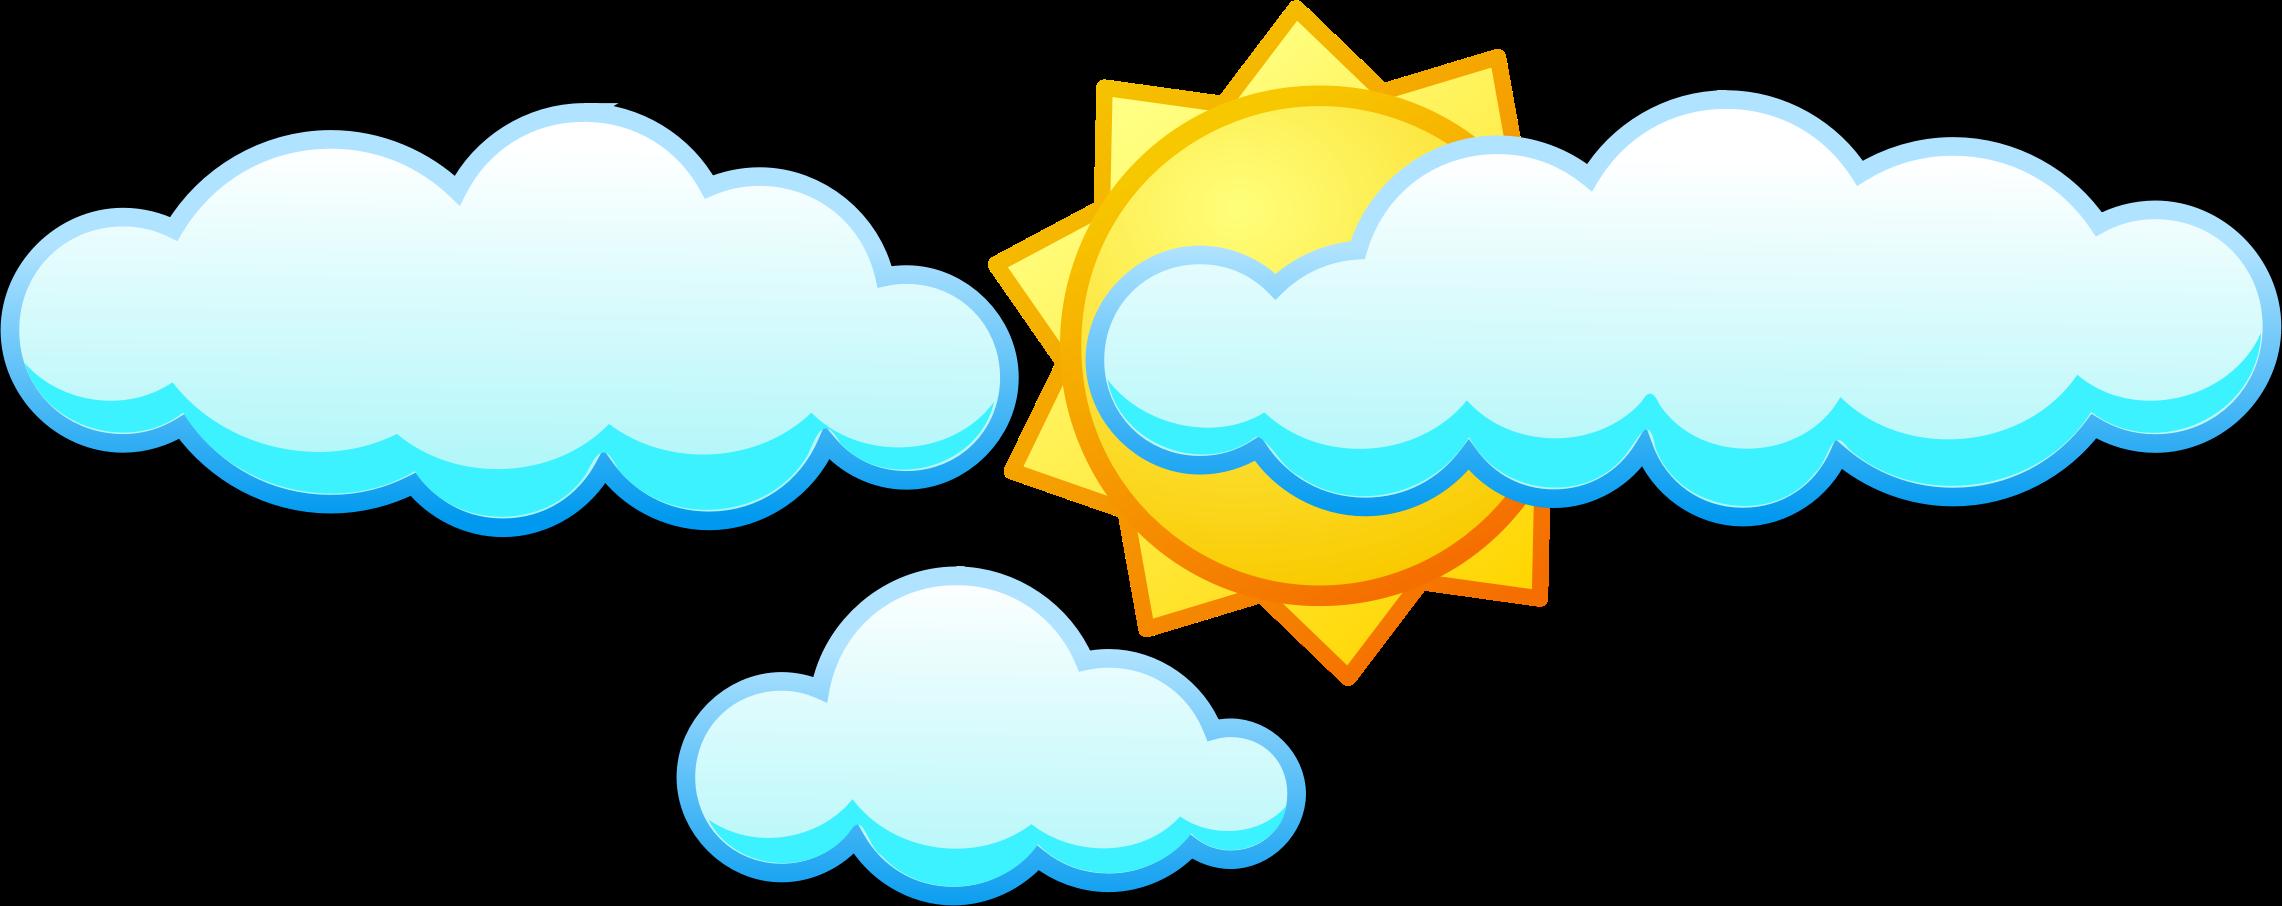 Sun Cloud Clipart.